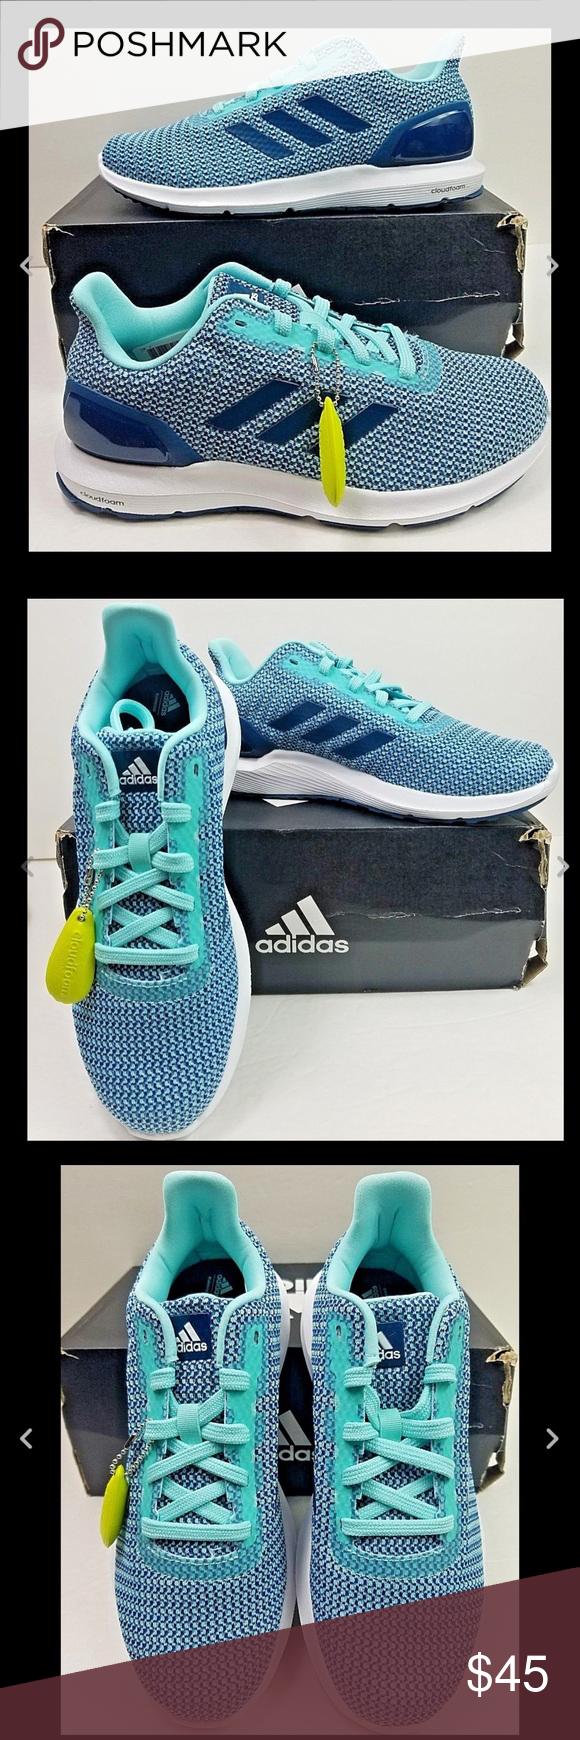 bca60840 Adidas Cosmic 2 Sl W knit sneakers running shoes 7 Adidas Cloudfoam ...